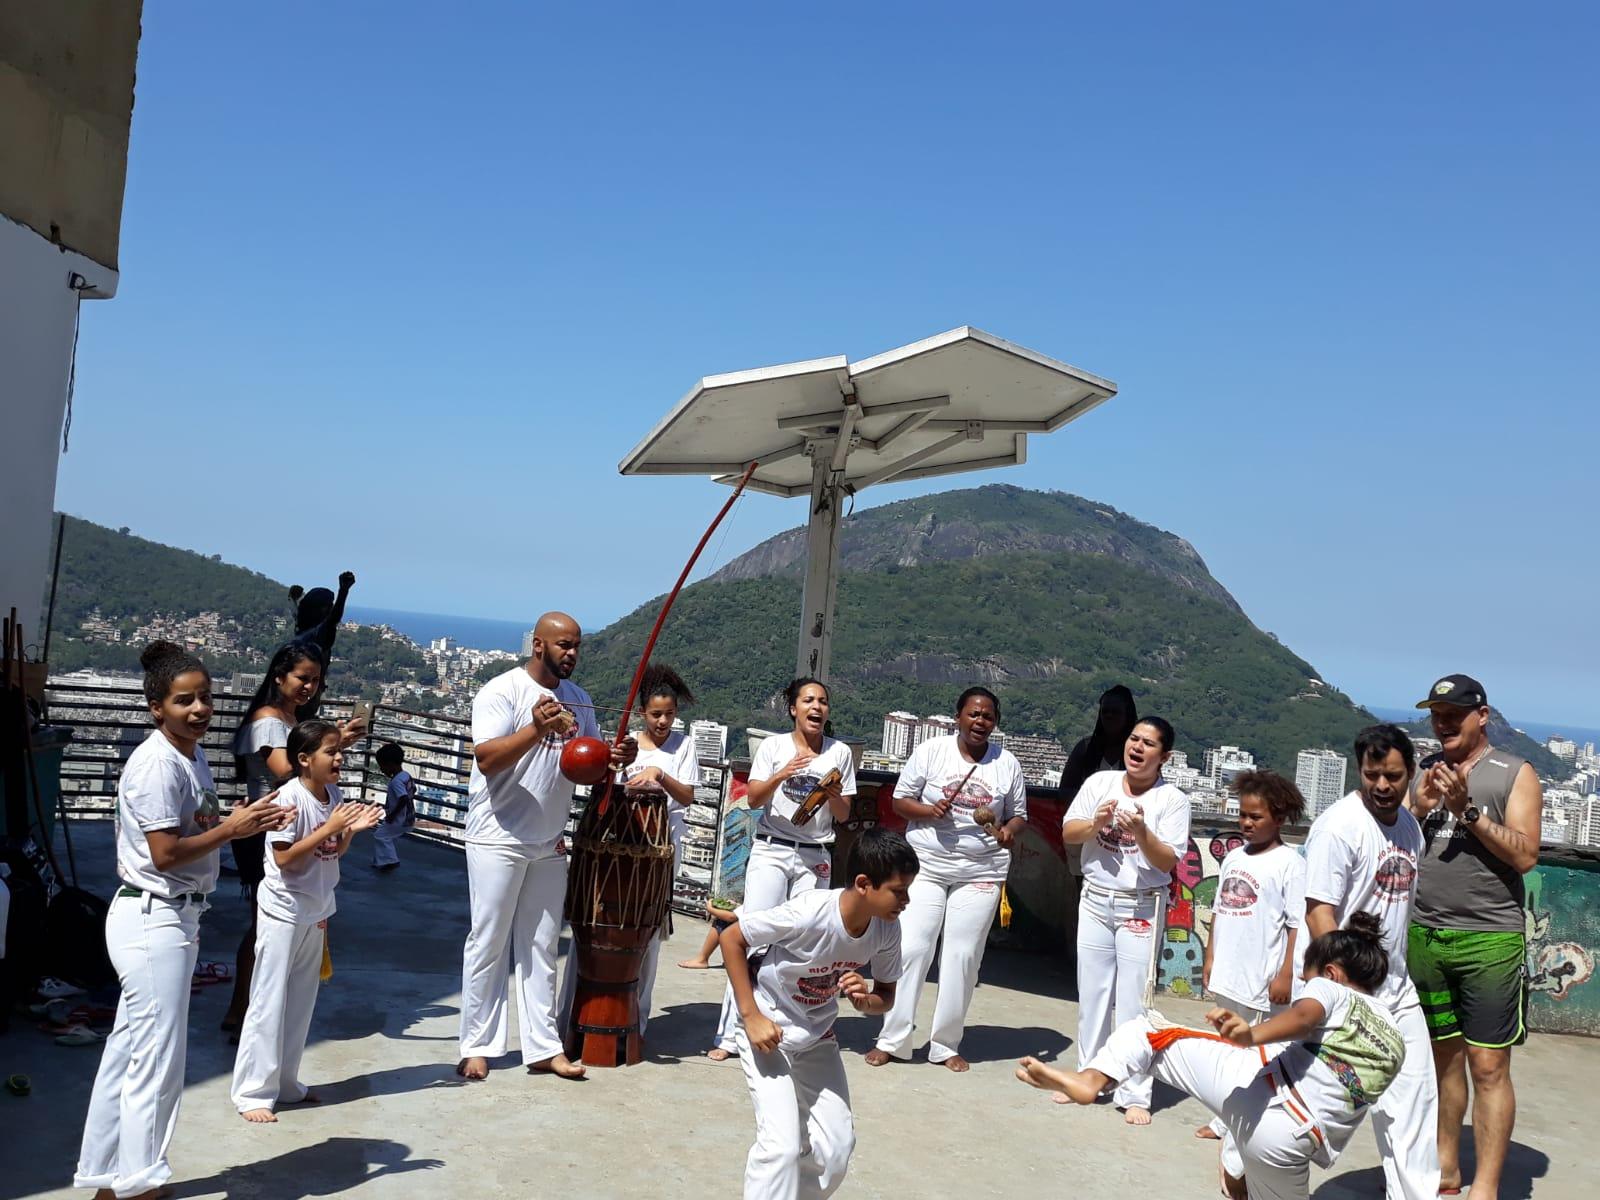 Projeto de Capoeira no Santa Marta transforma a vida dos moradores